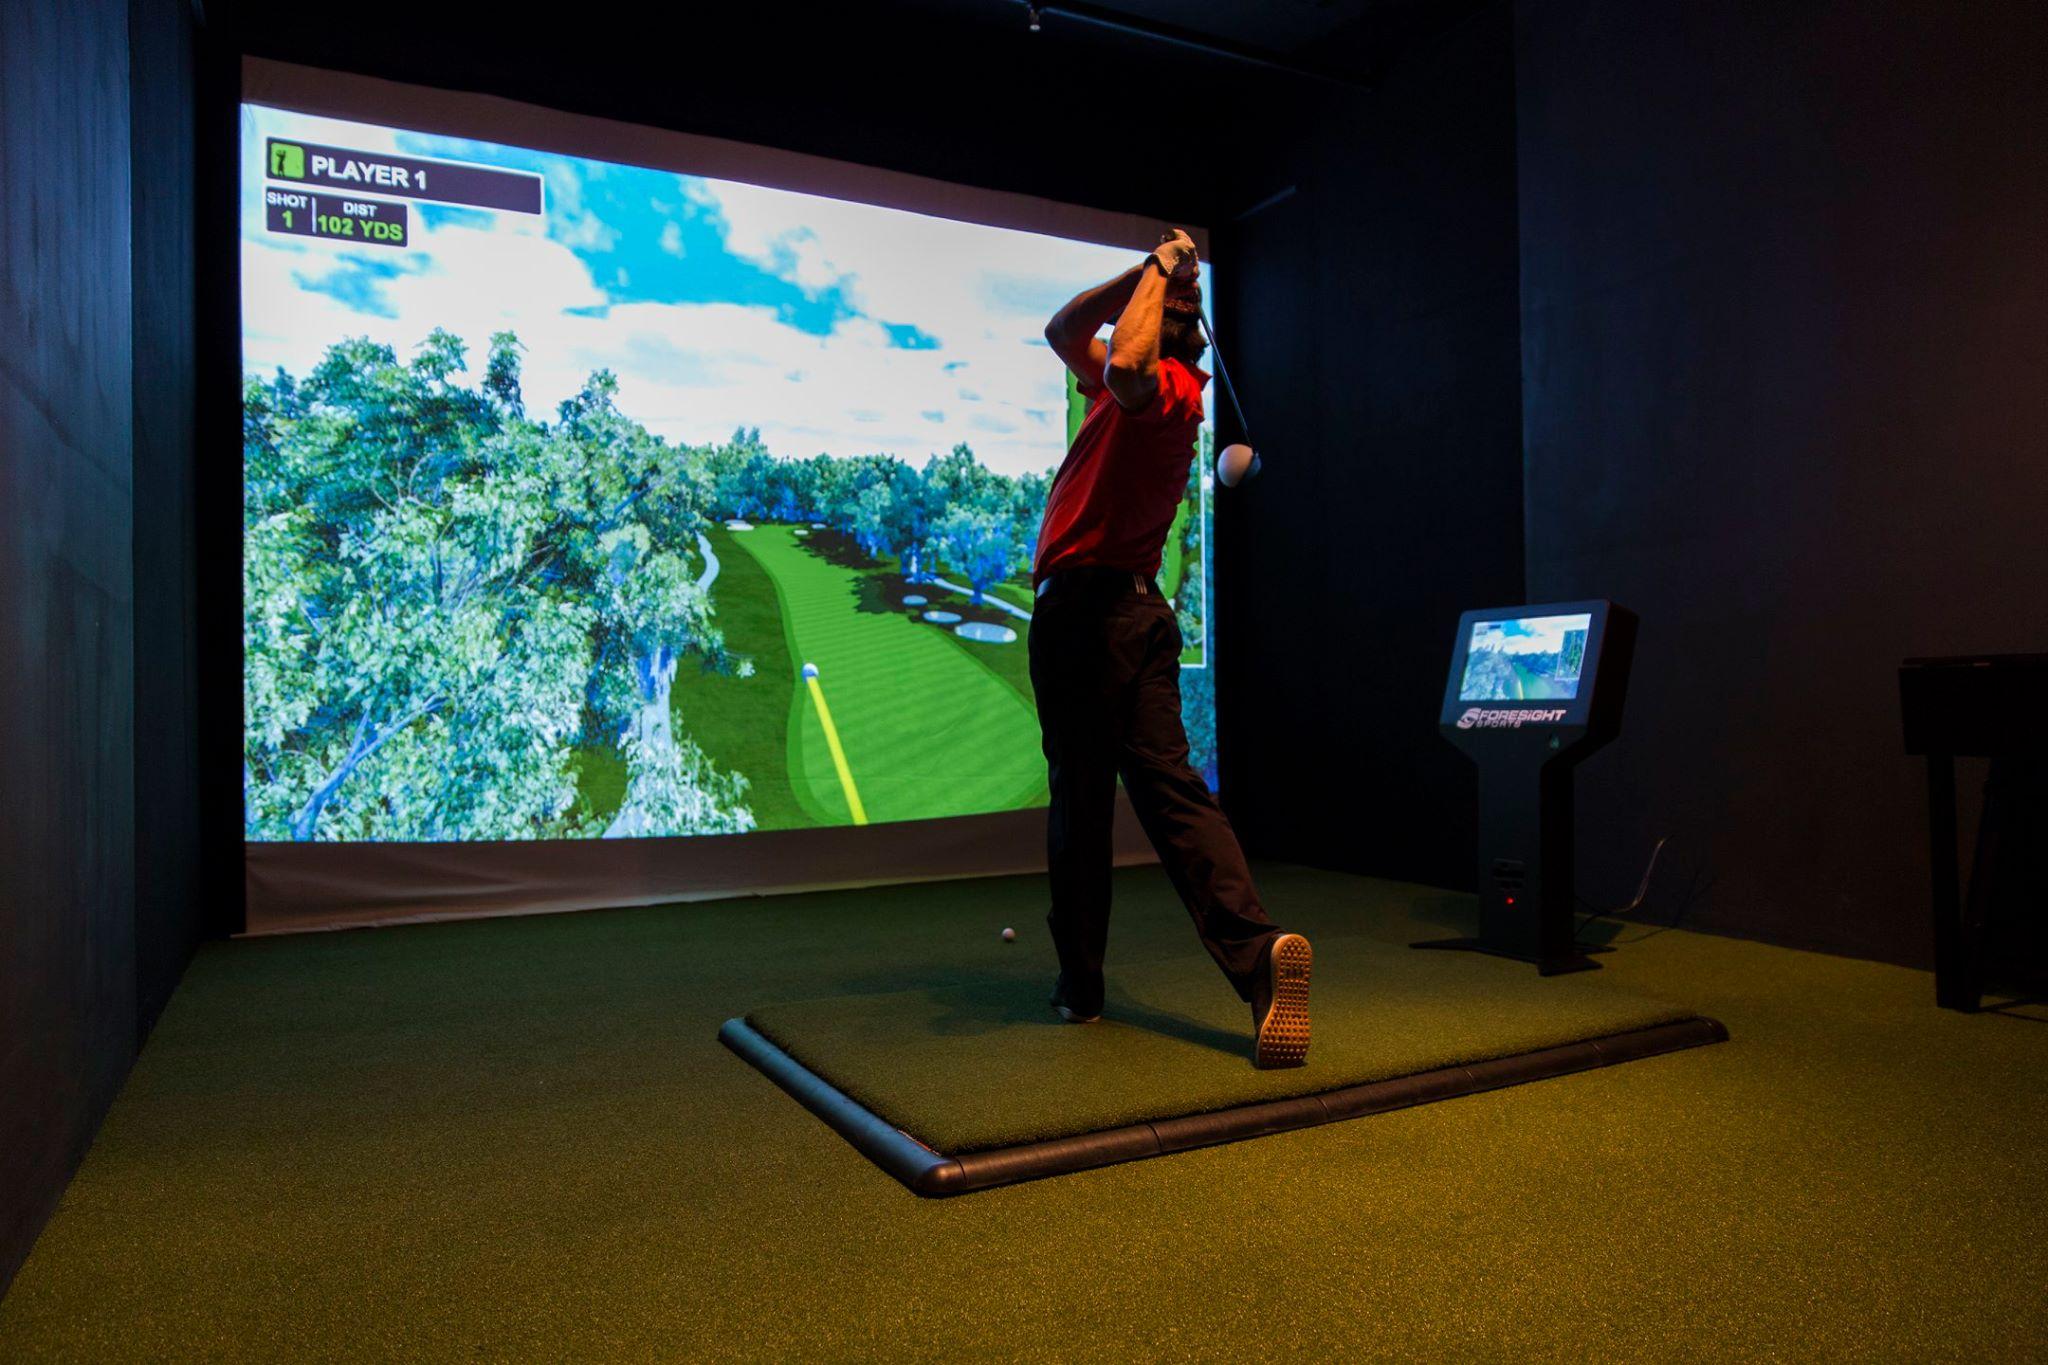 image: premiere golf